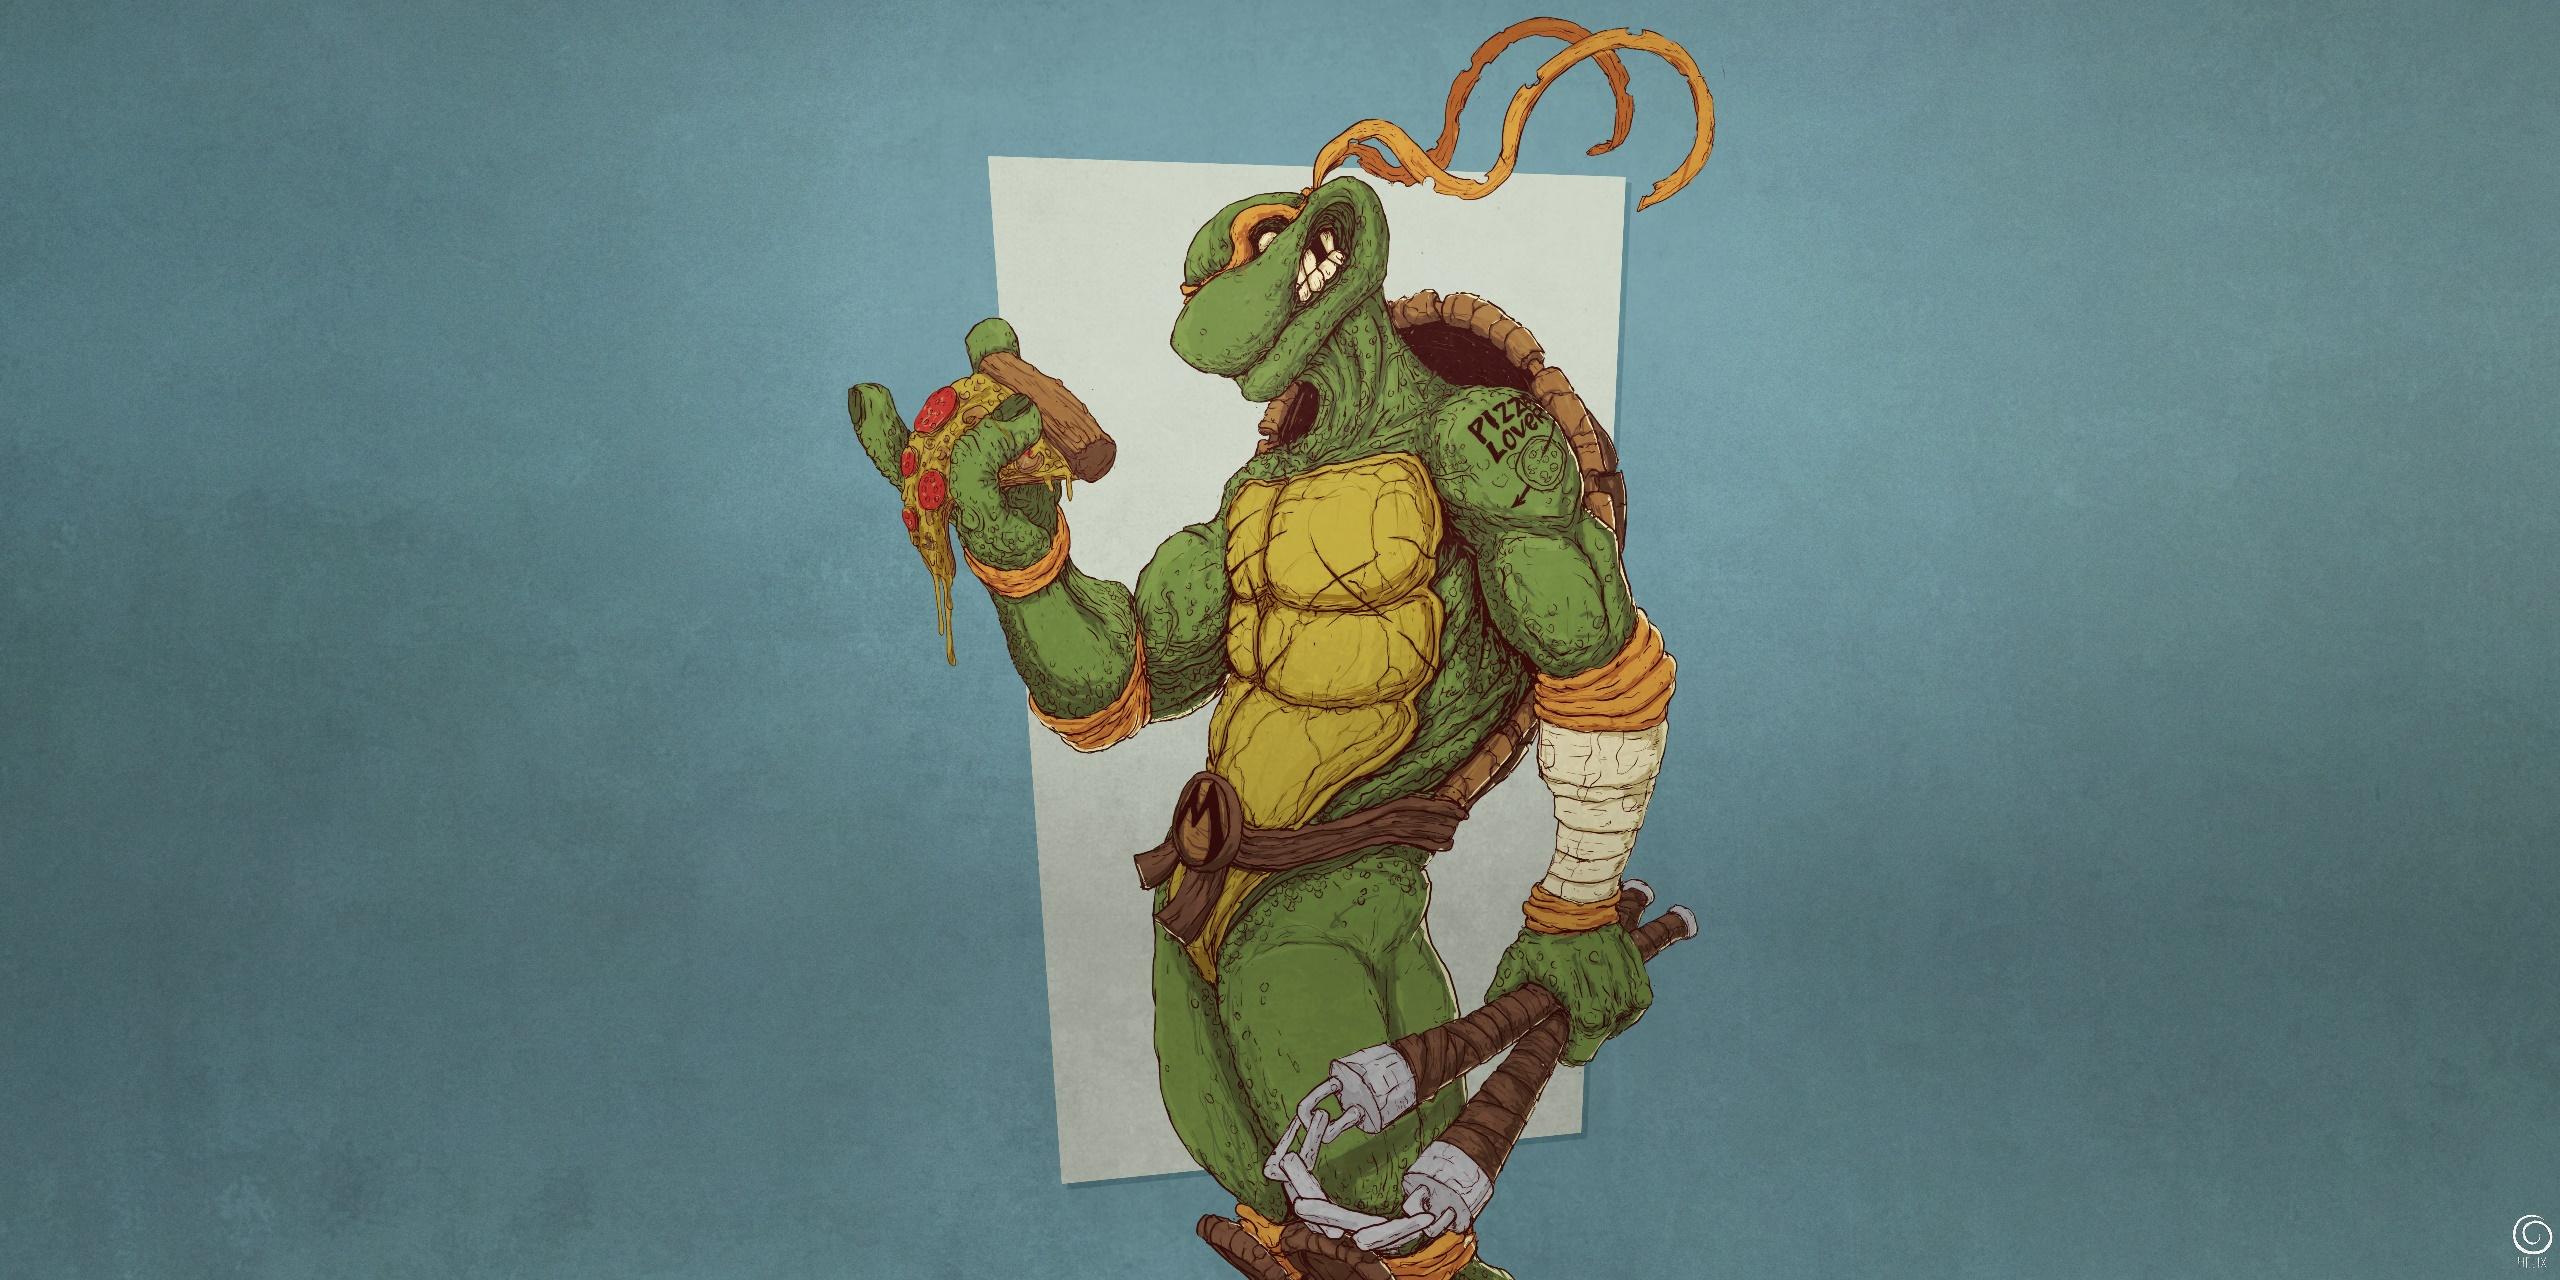 Teenage Mutant Ninja Turtles Pizza Wallpaper Novocom Top